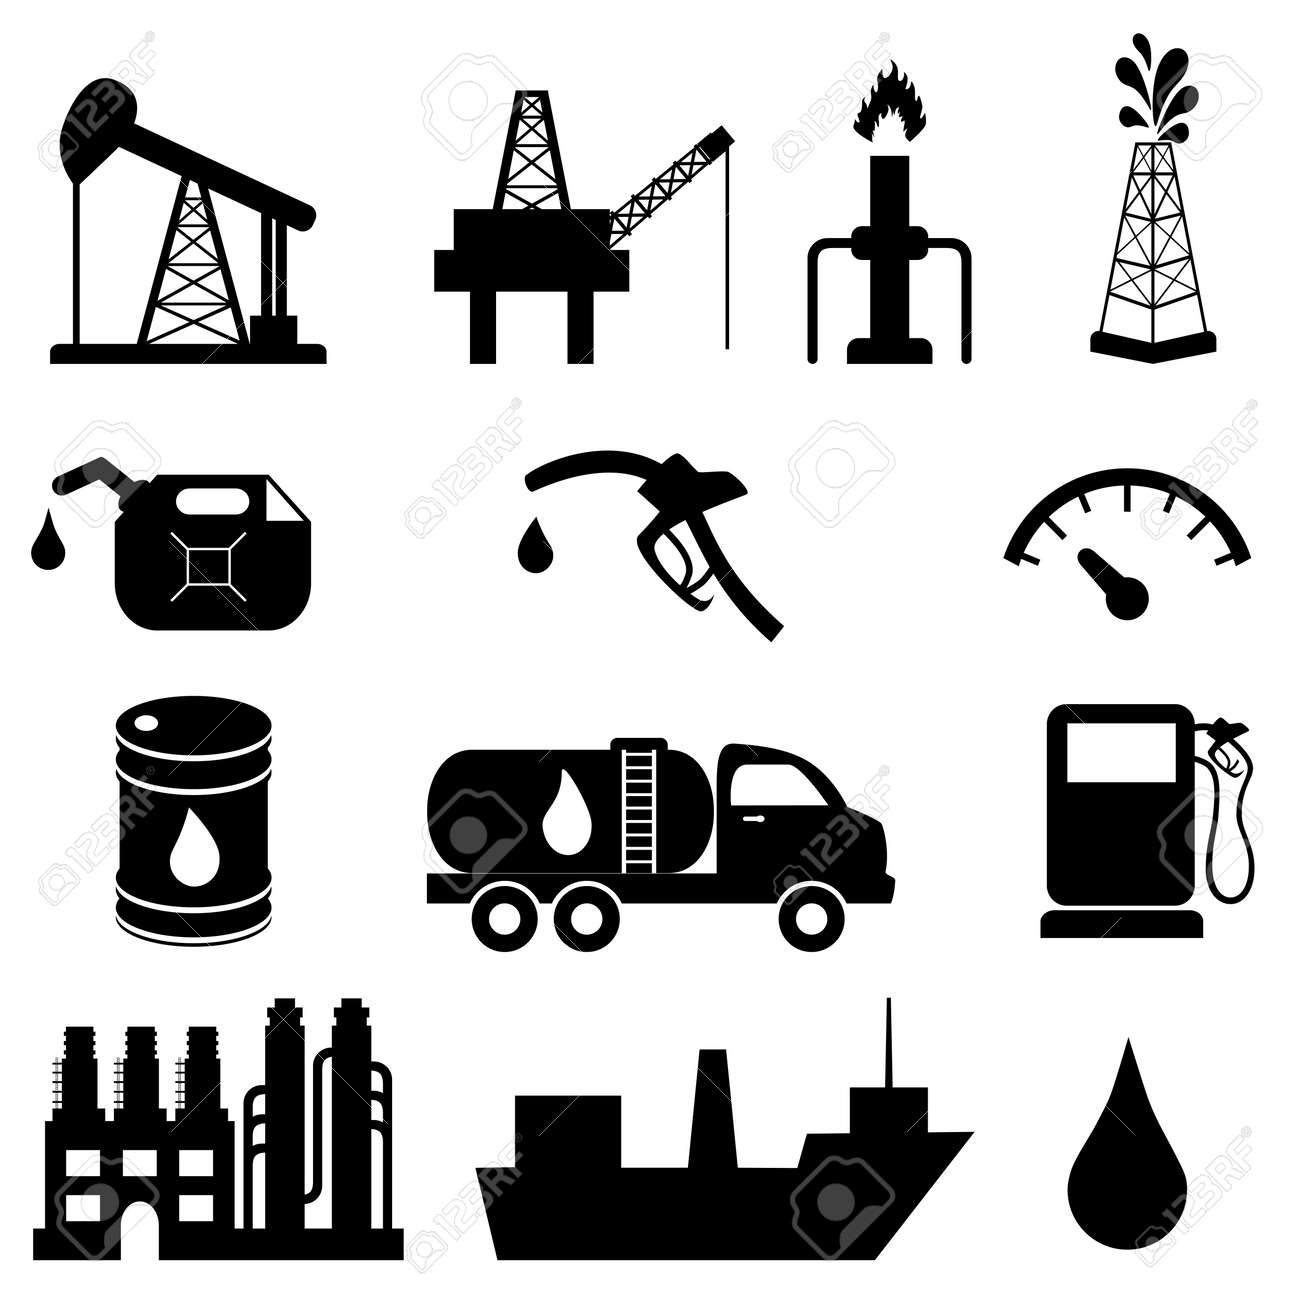 Oil and petroleum icon set - 14835137